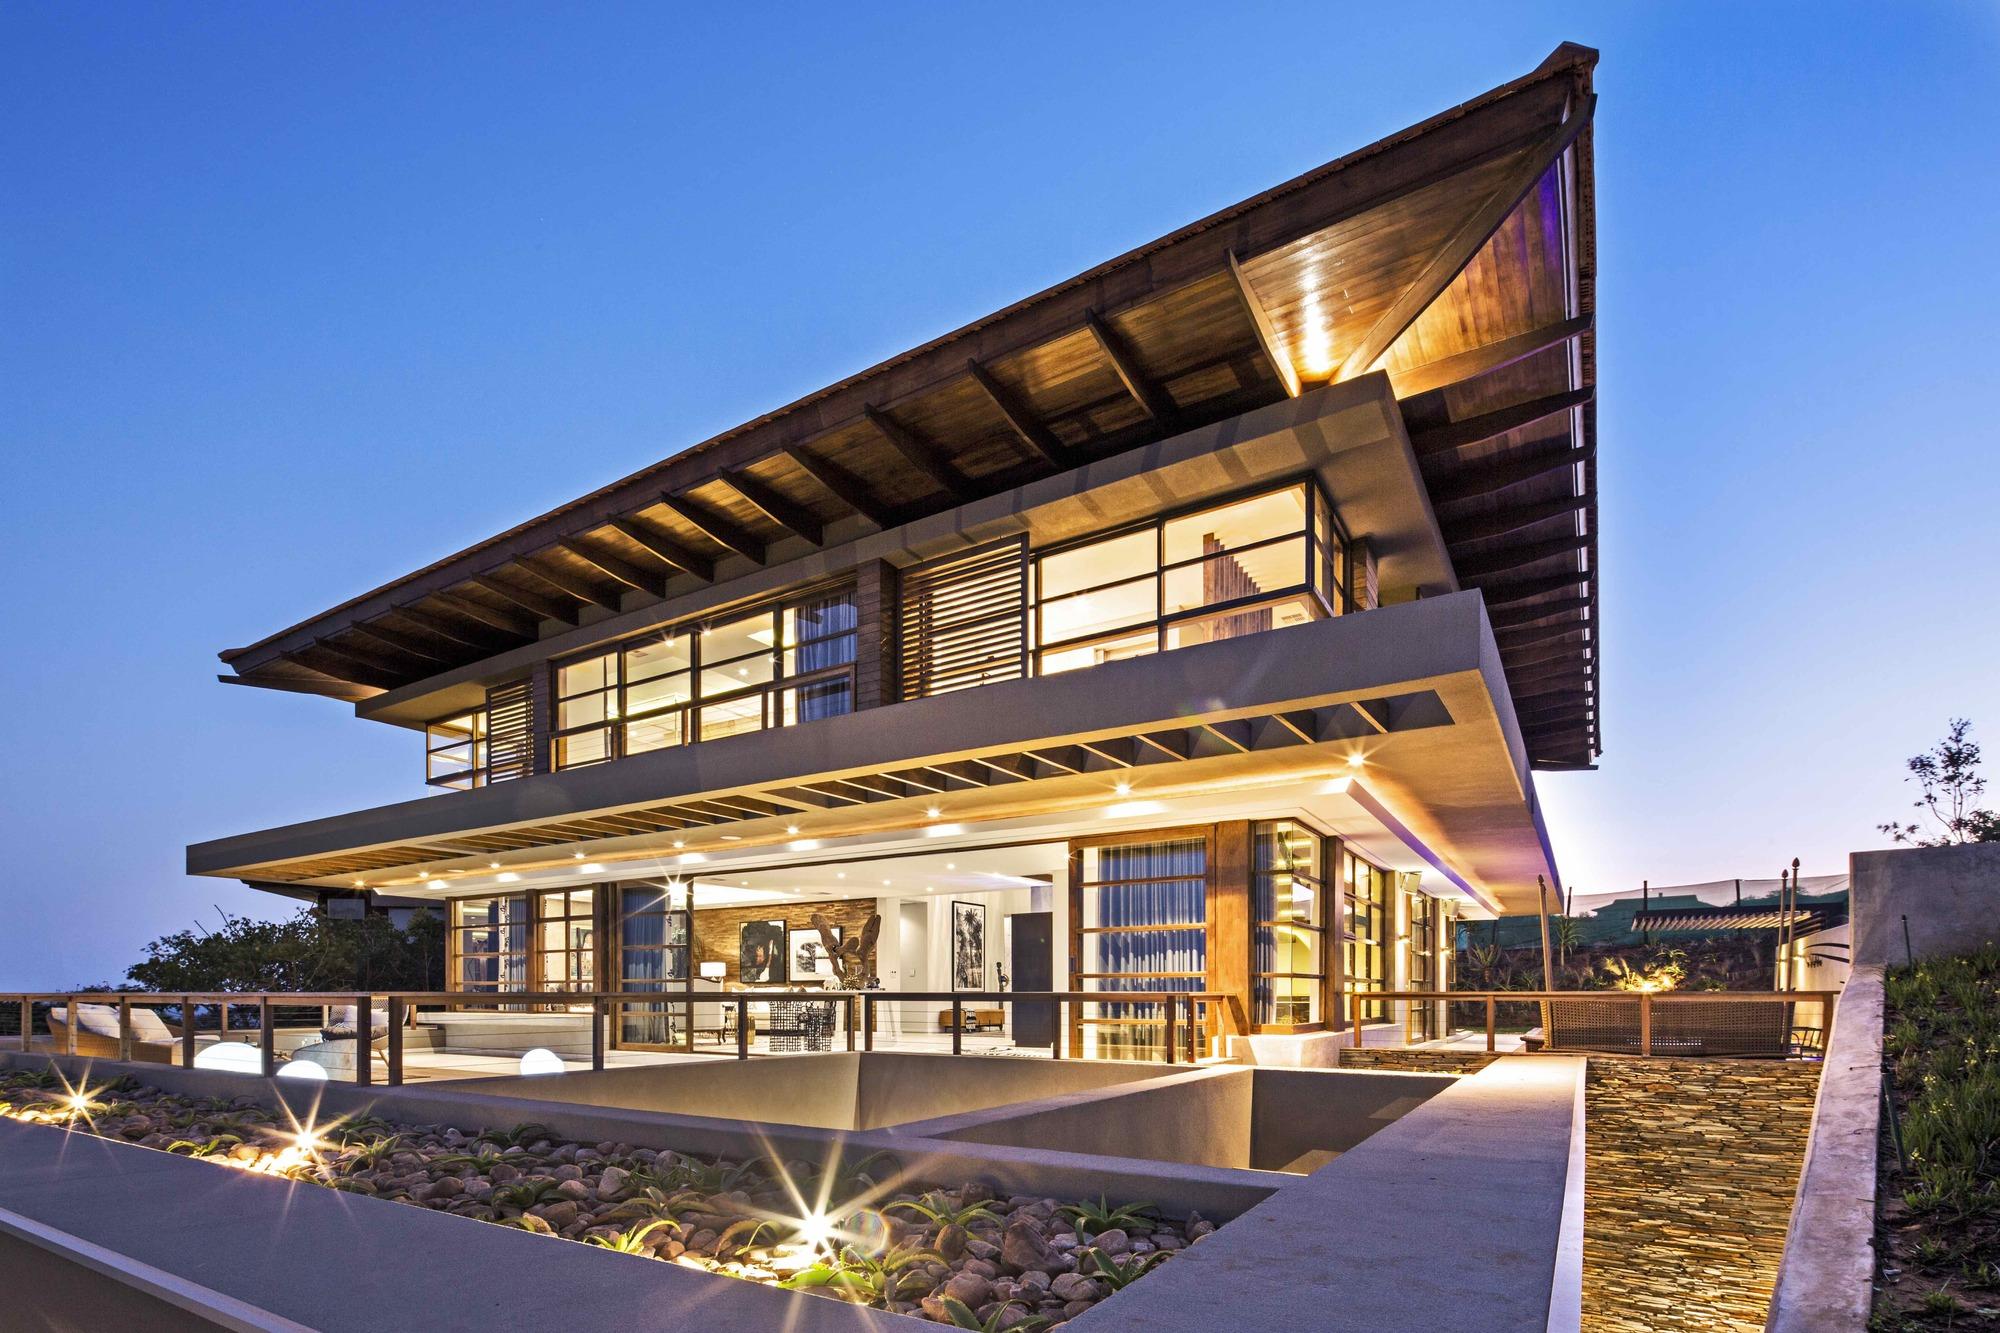 galer a de 6 leadwood loop metropole architects 6. Black Bedroom Furniture Sets. Home Design Ideas